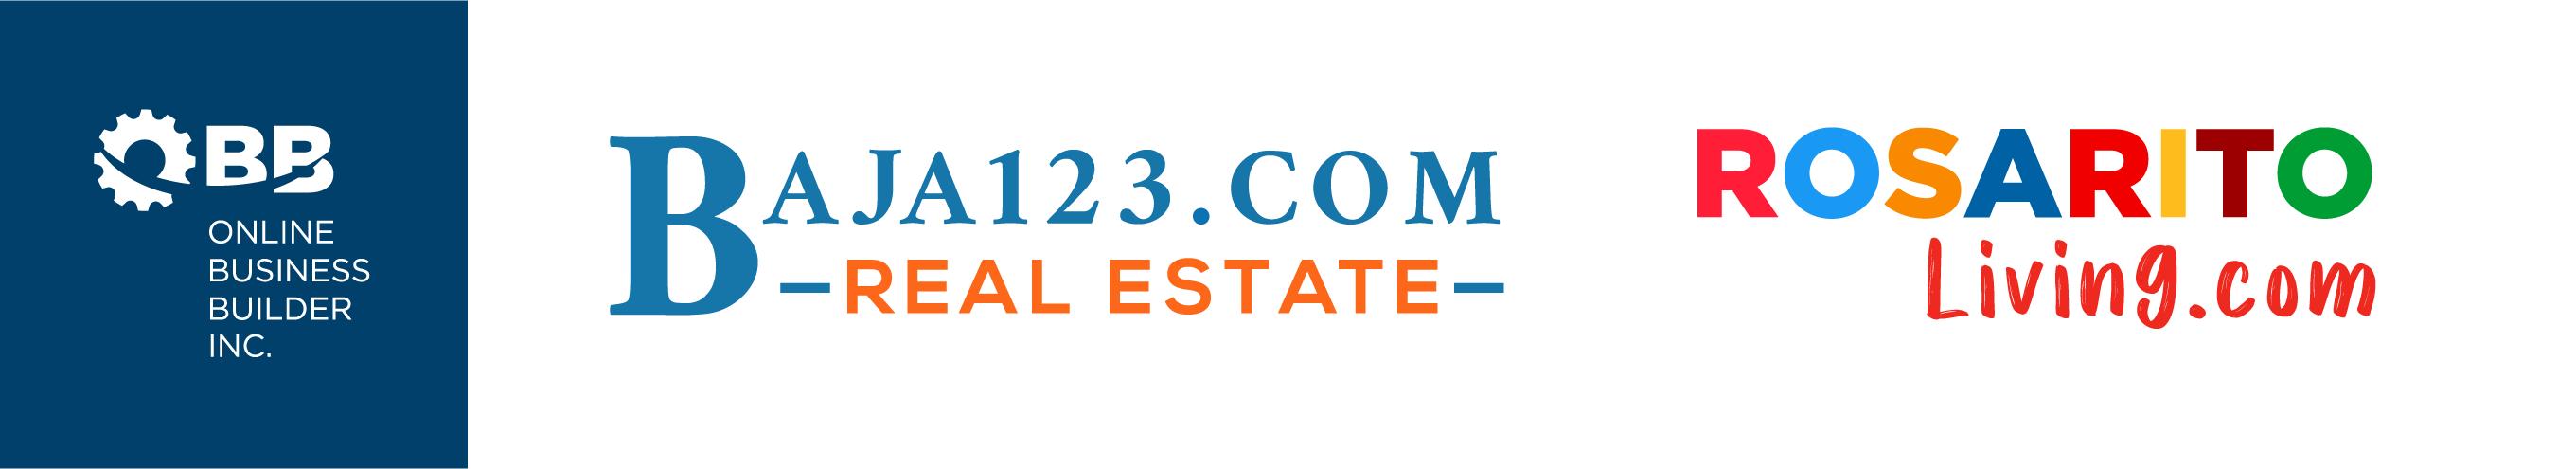 Baja123.com Real Estate